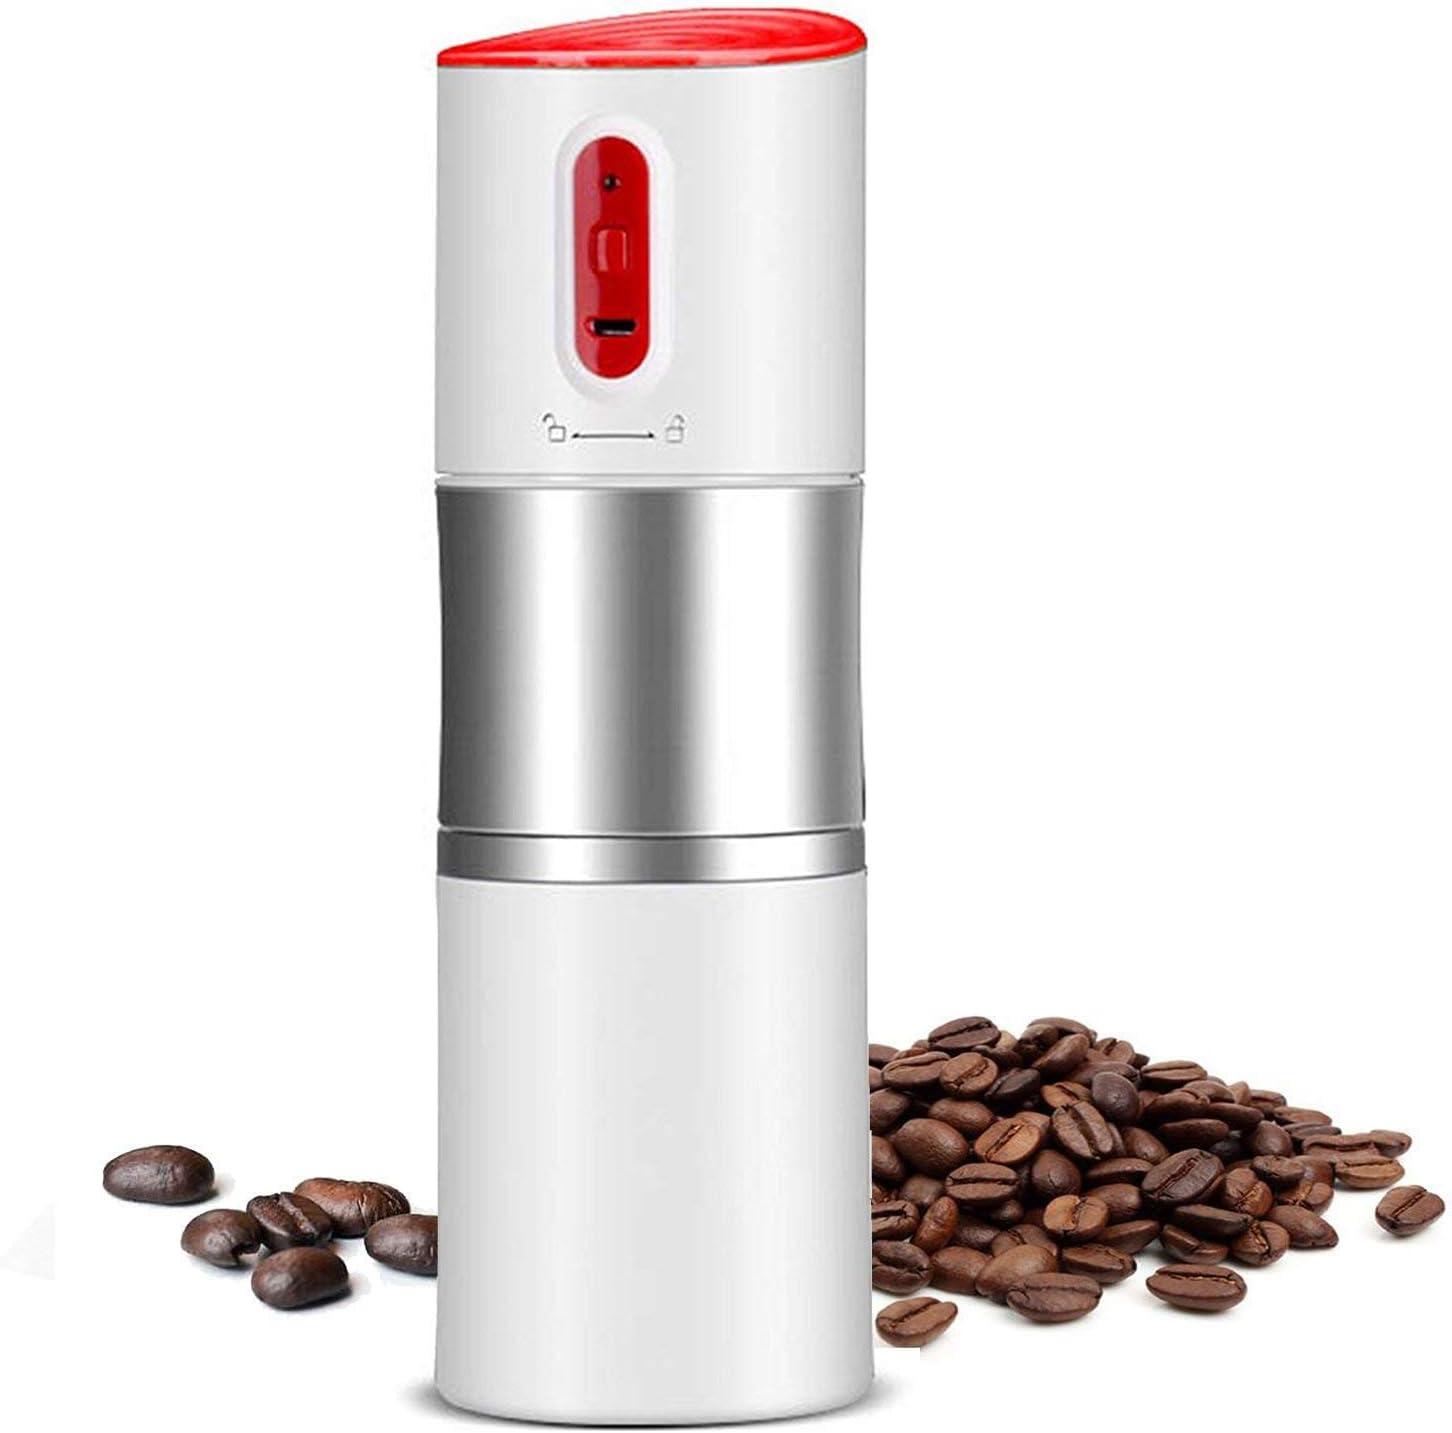 Semoic - Molinillo de café portátil, cafetera automática ...